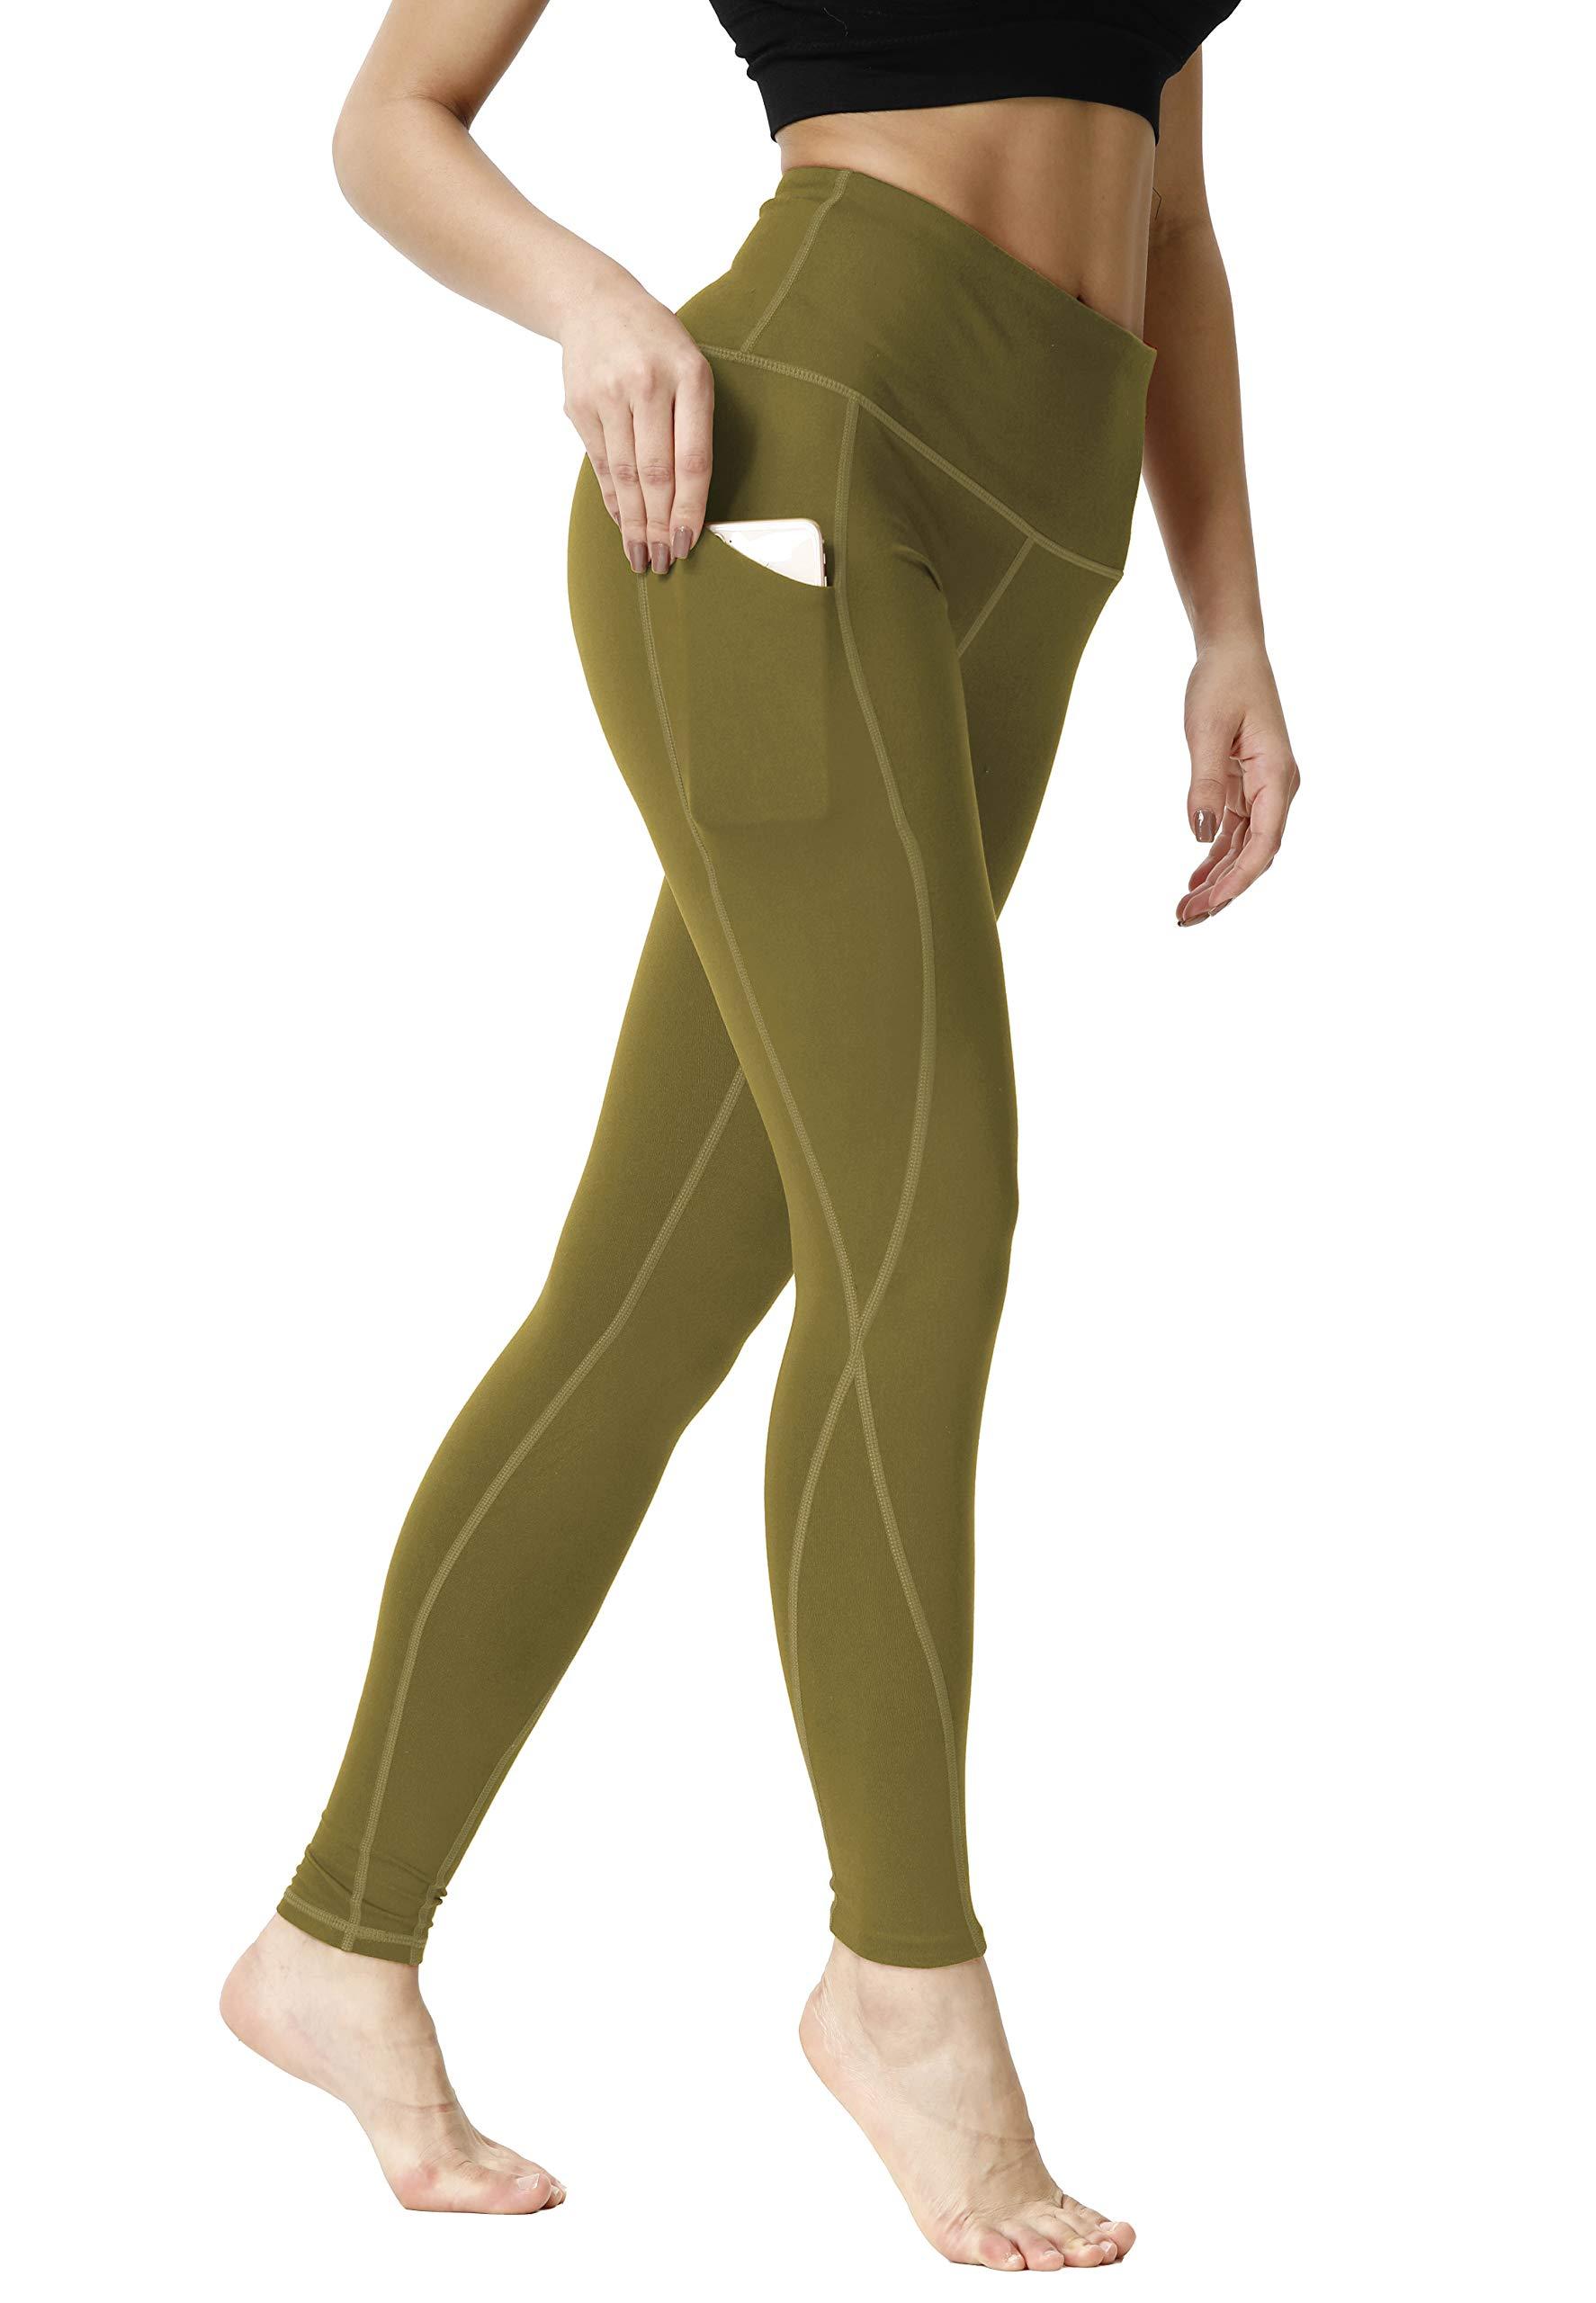 SILKWORLD Women's Yoga Pants Pockets High Waist Stretch Workout Leggings